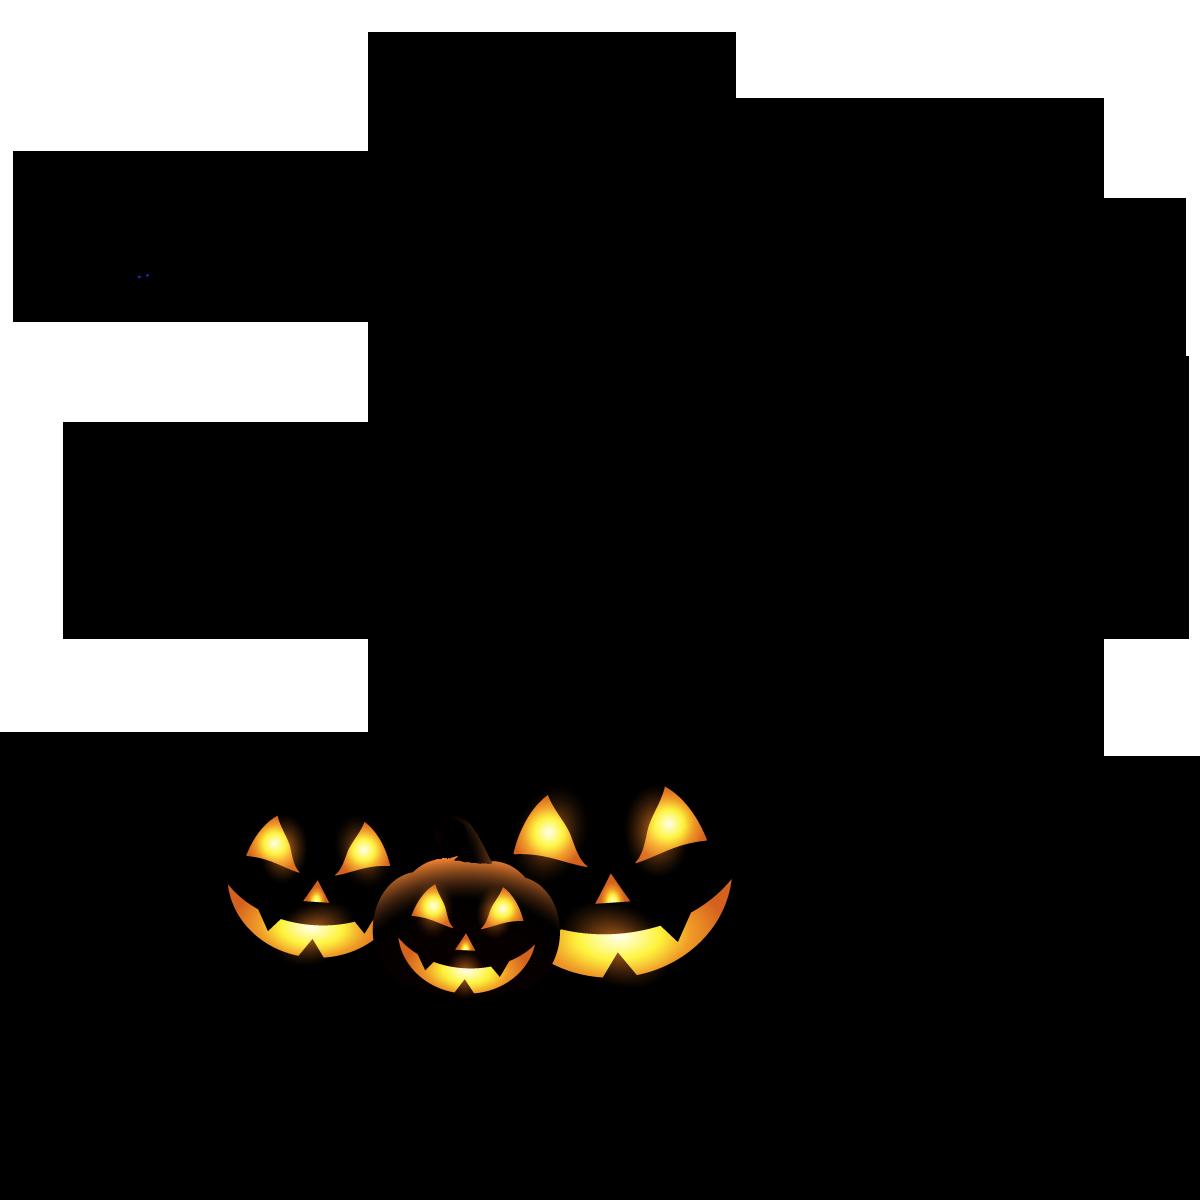 Halloween Spooktacular Costume party Clip art